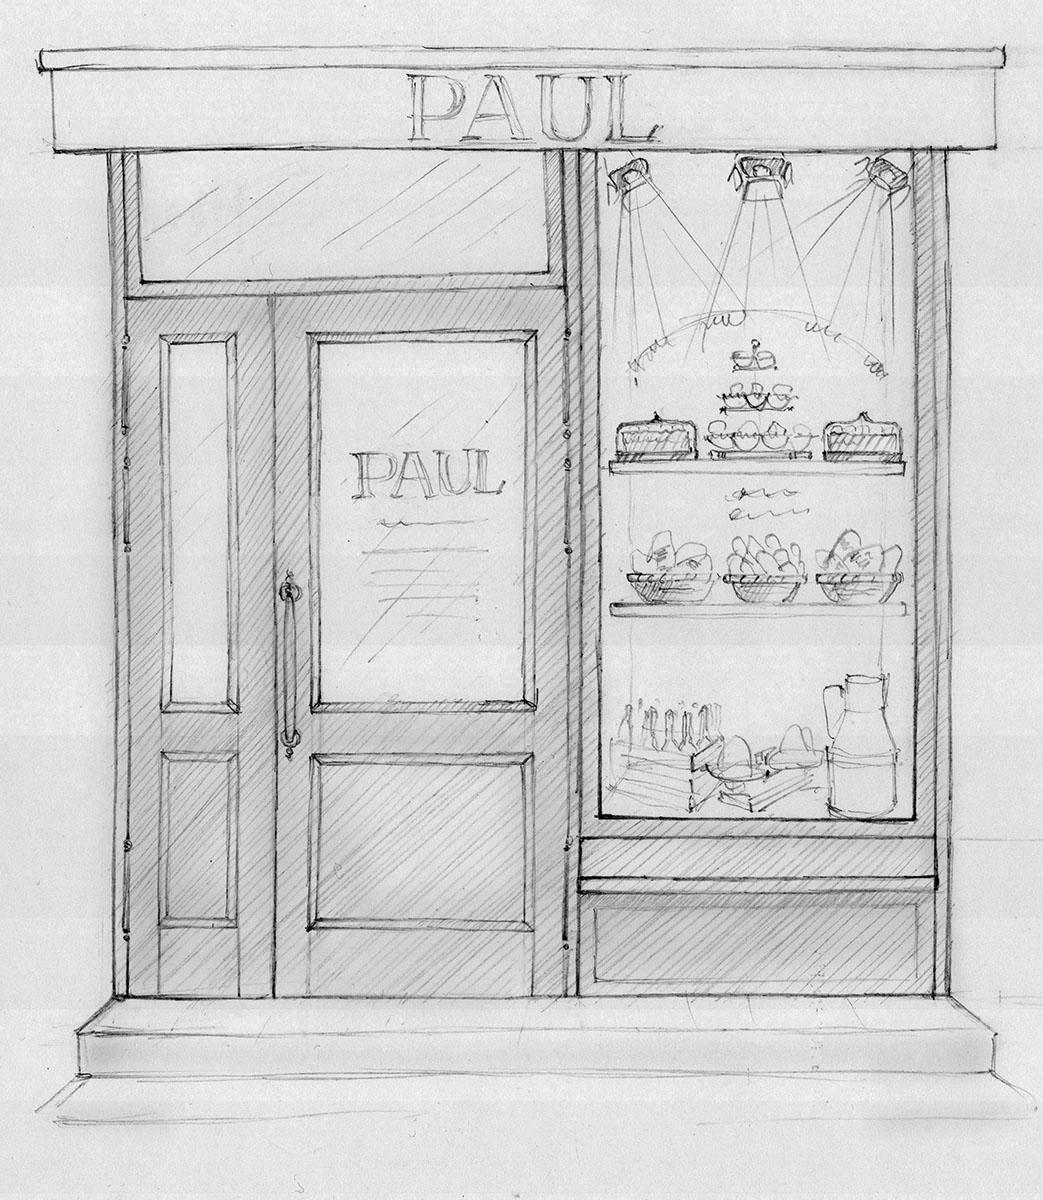 Paul_boulangerie_decor (1)